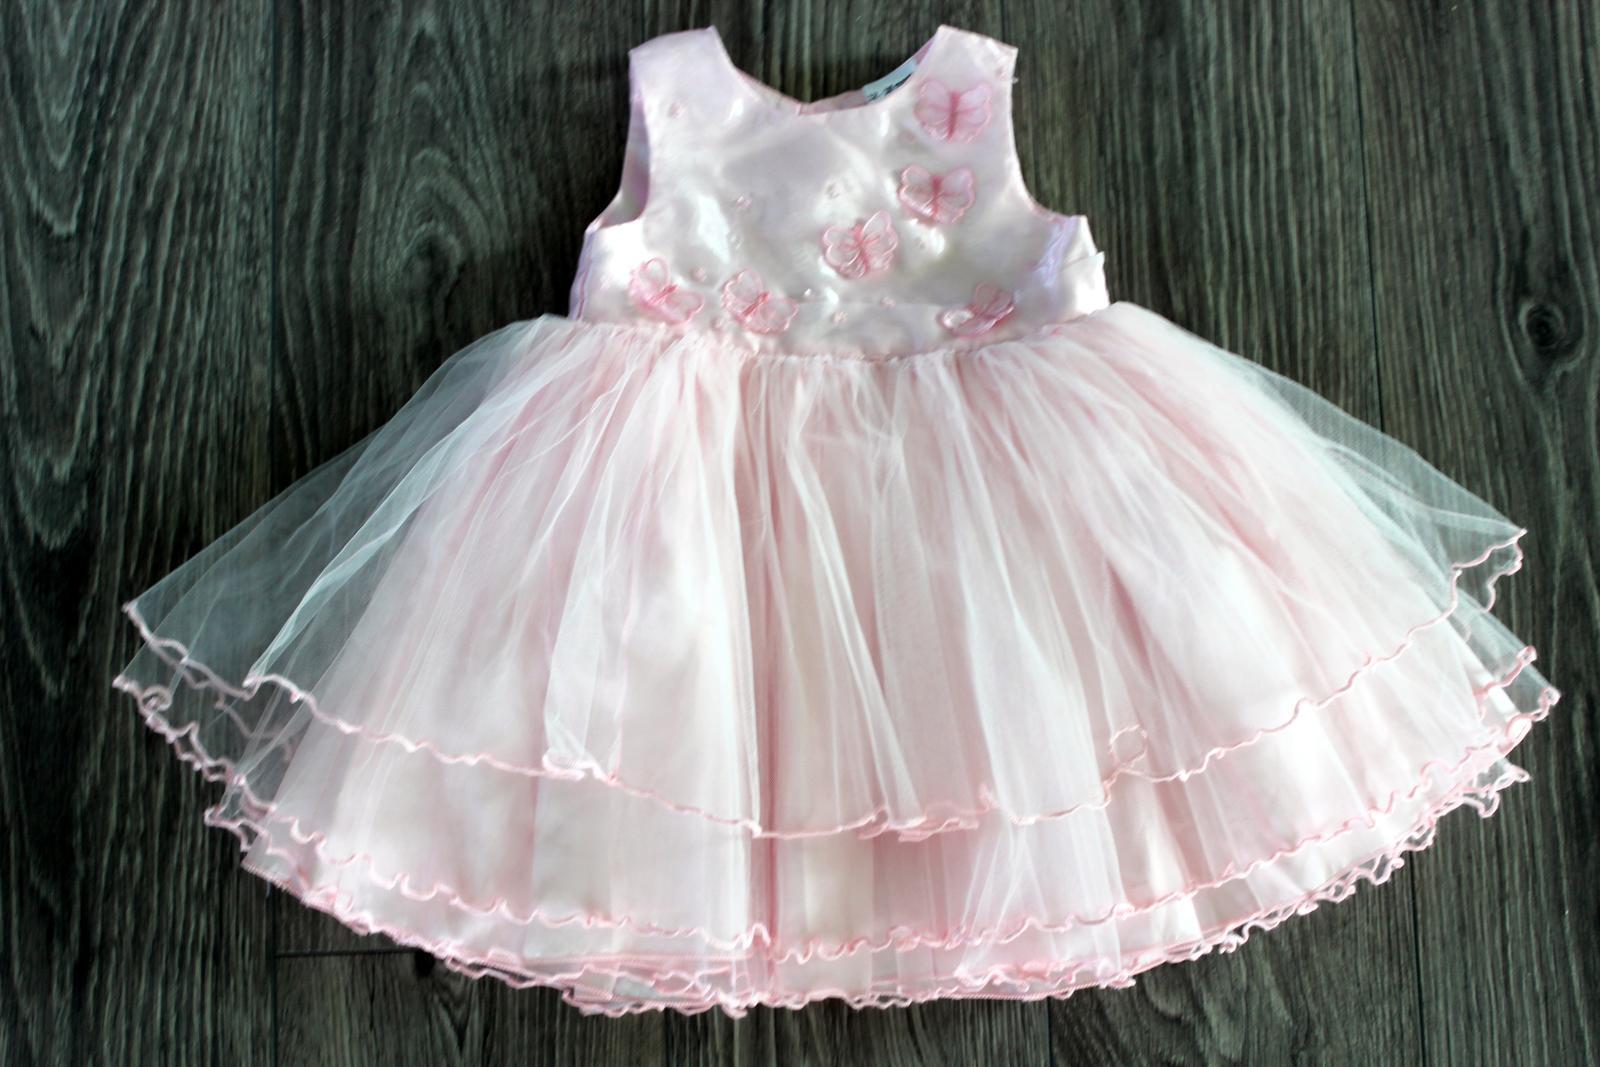 d5f9c85d66a1 Dievčenské šaty